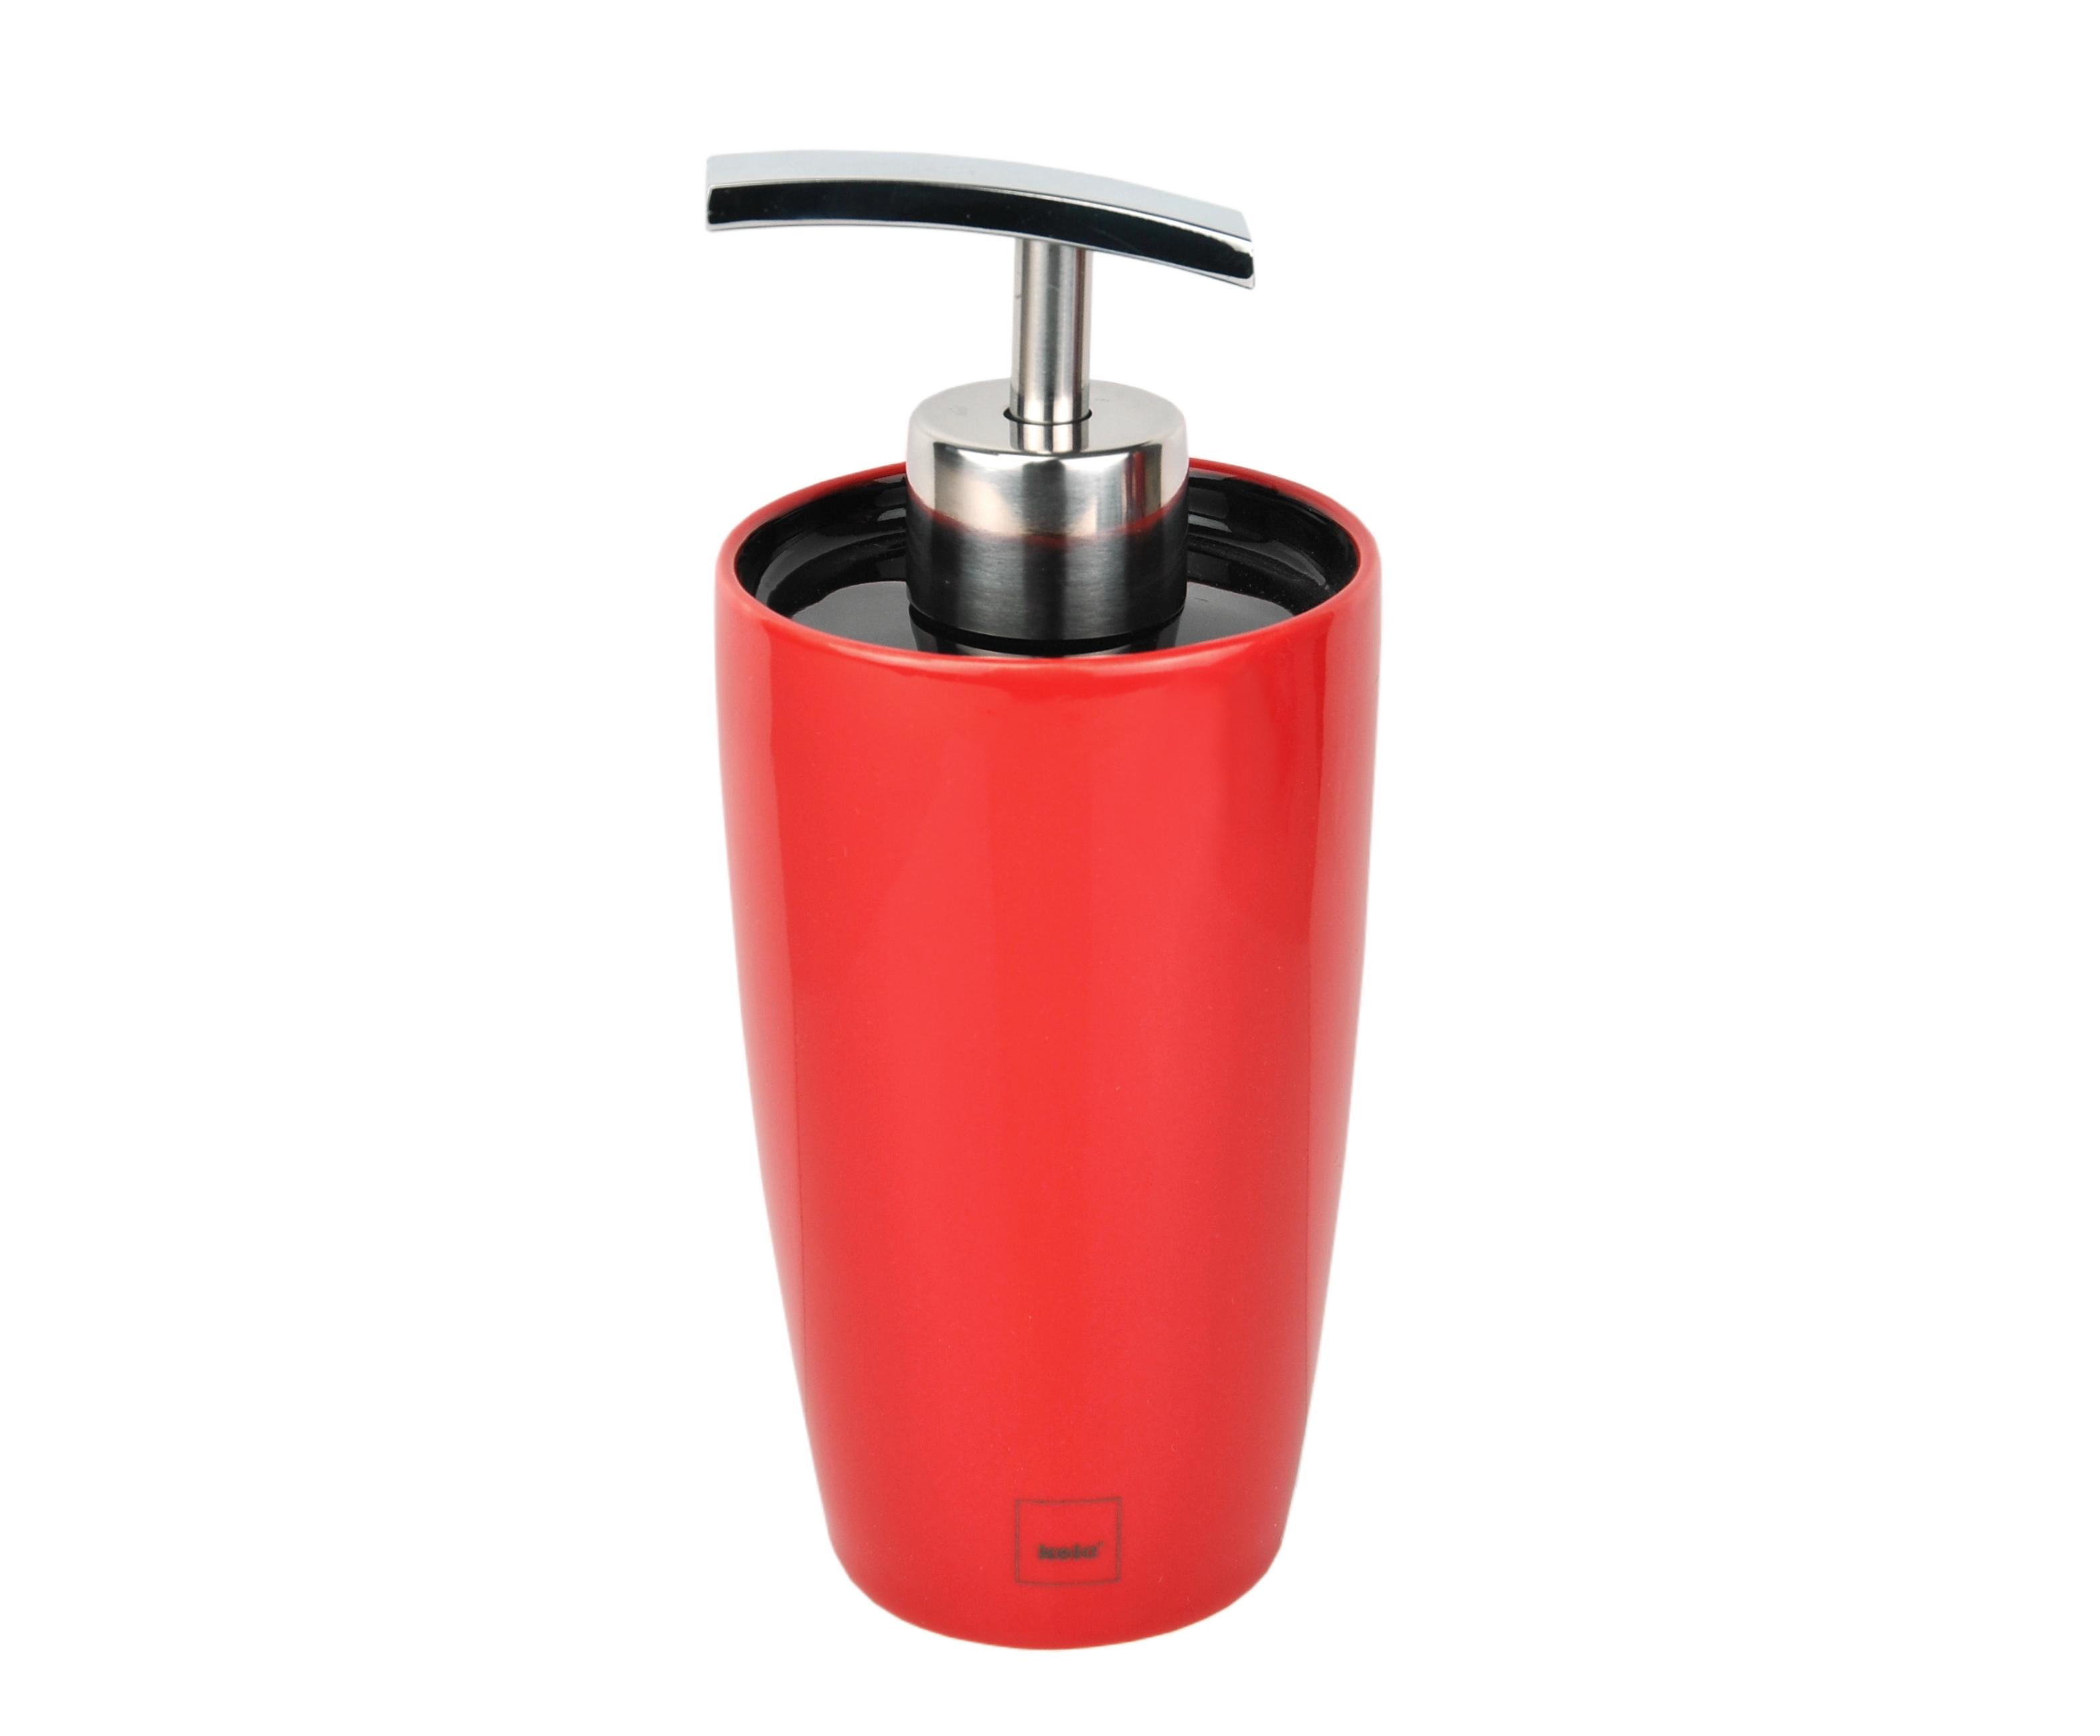 KELA WC Garnitur WC Bürstenhalter aus Keramik Toilettenbürste Rot Edelstahl